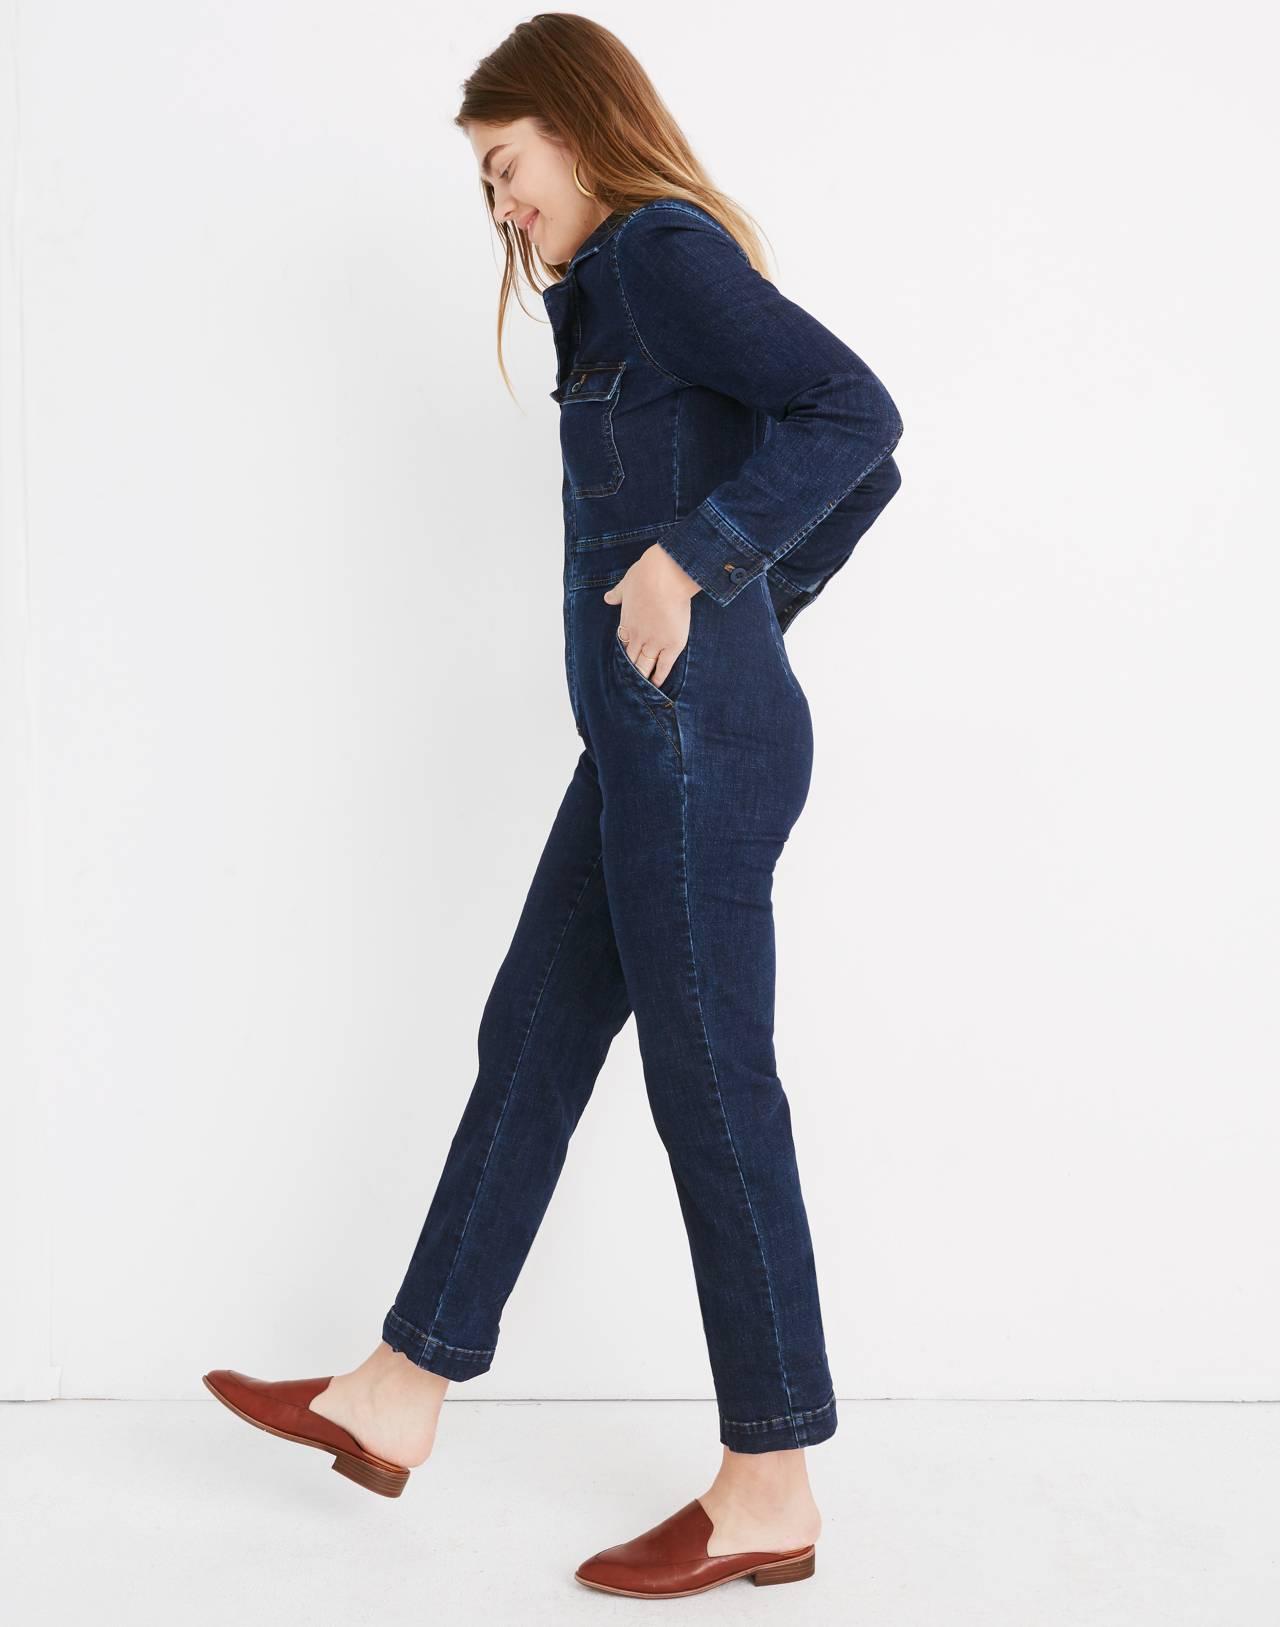 Denim Slim Coverall Jumpsuit in fanning wash image 2